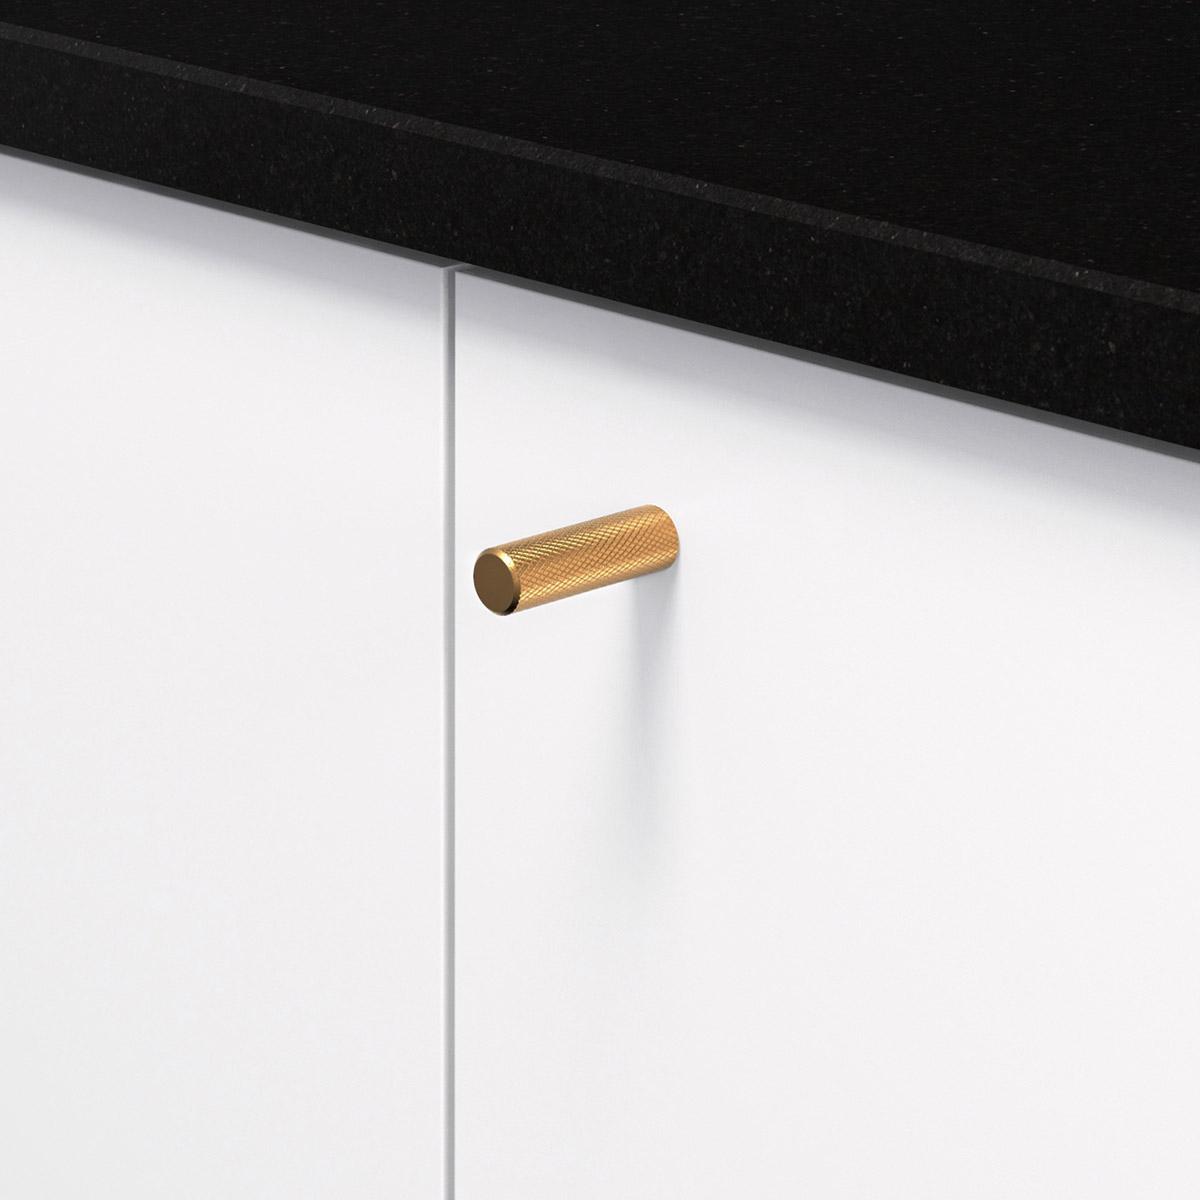 Knopp massing 370225 11 10 mm ncs s 0300 n granit svart